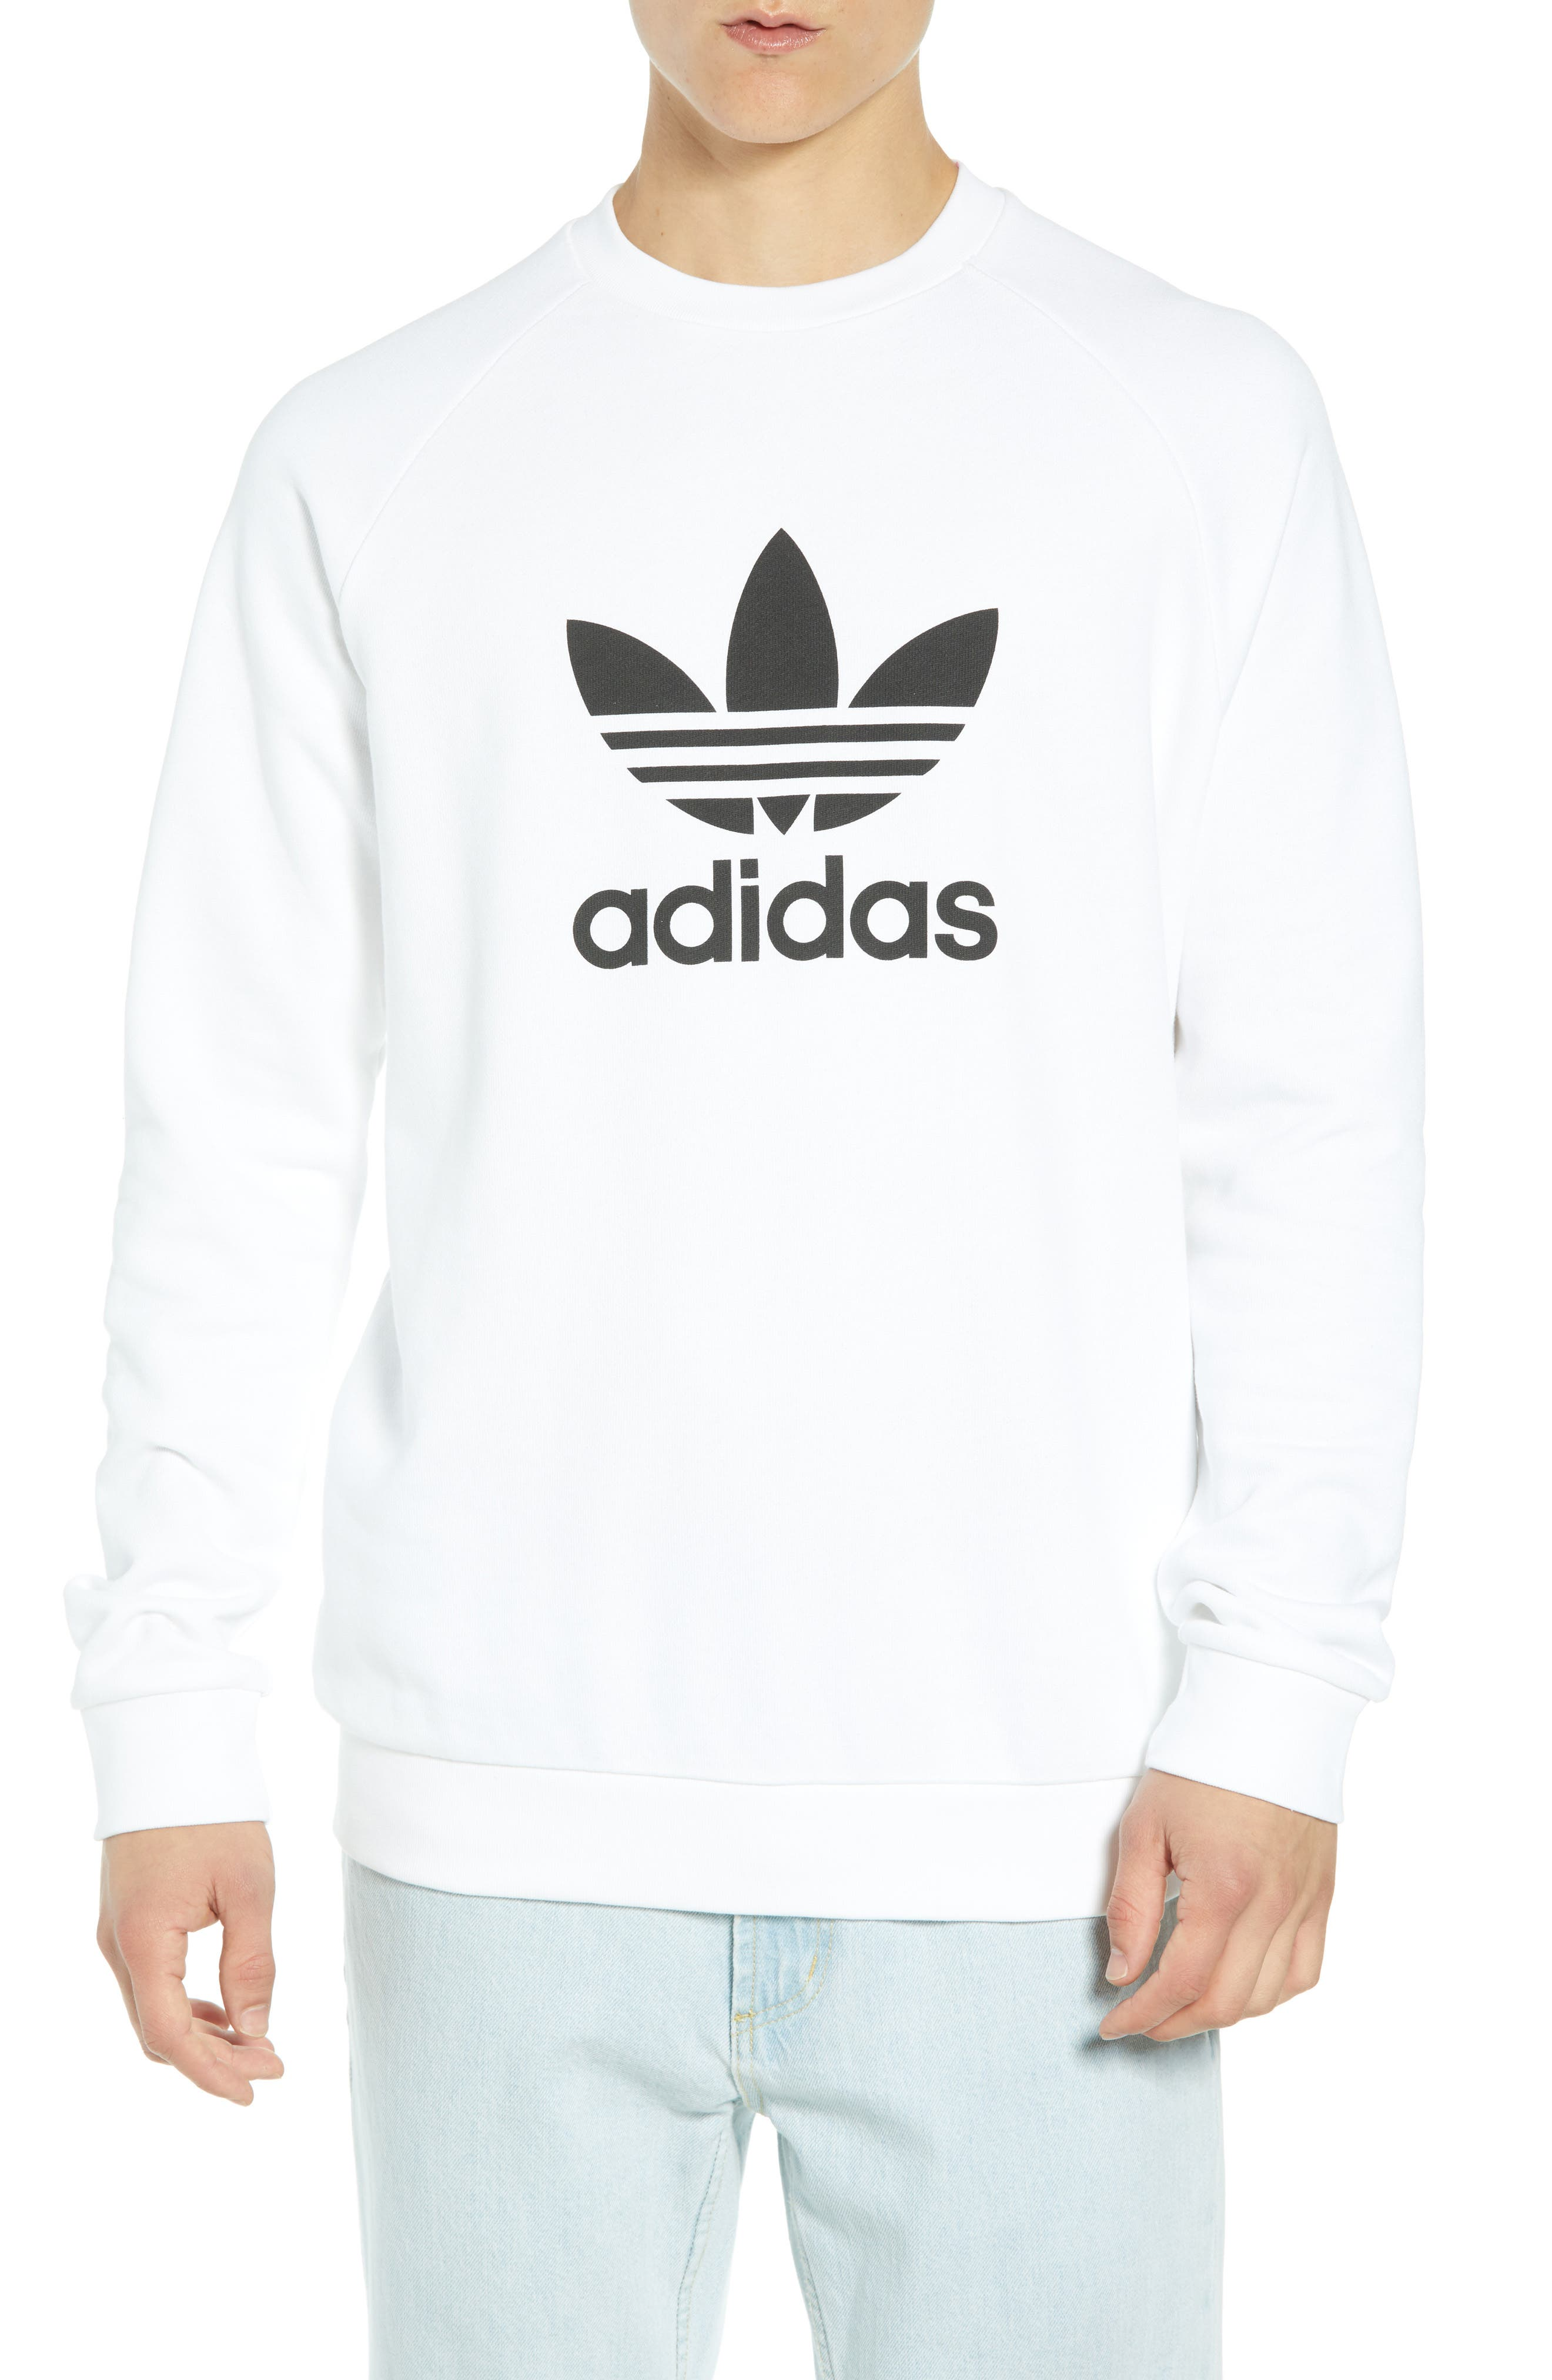 ADIDAS ORIGINALS, Trefoil Sweatshirt, Main thumbnail 1, color, WHITE